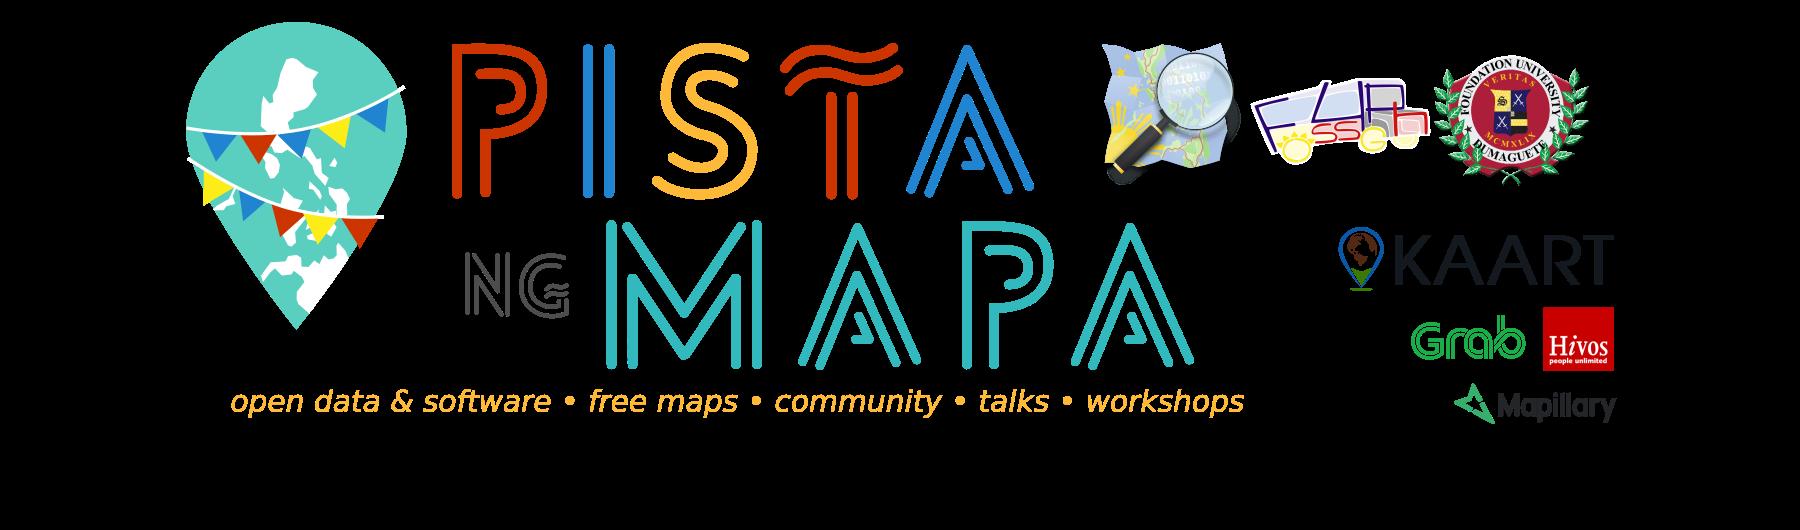 Pista ng Mapa 2019, Dumaguete City